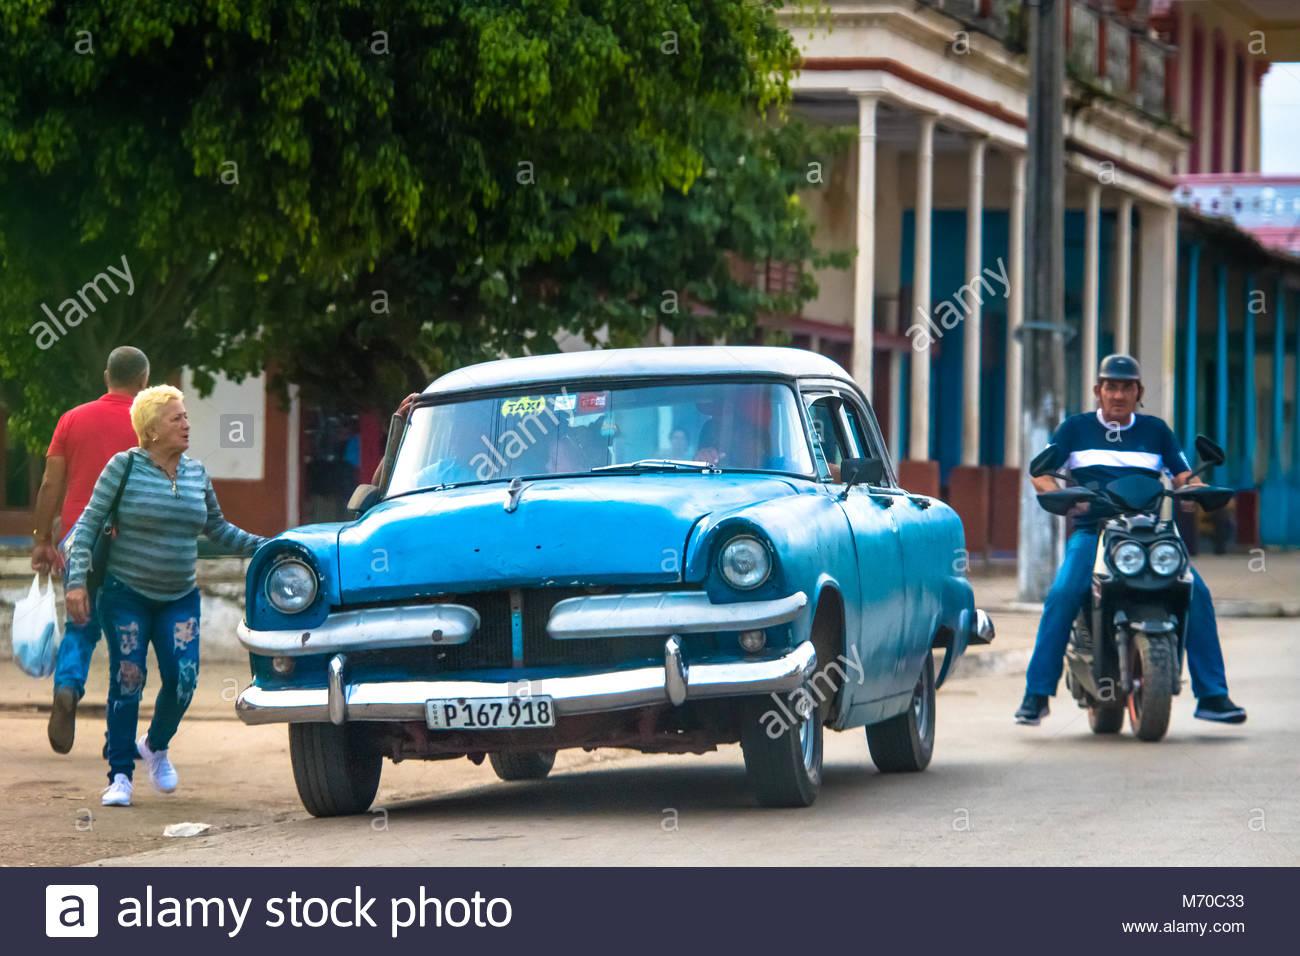 Placetas Cuba January 1 2018 Old Vintage American Cars Still